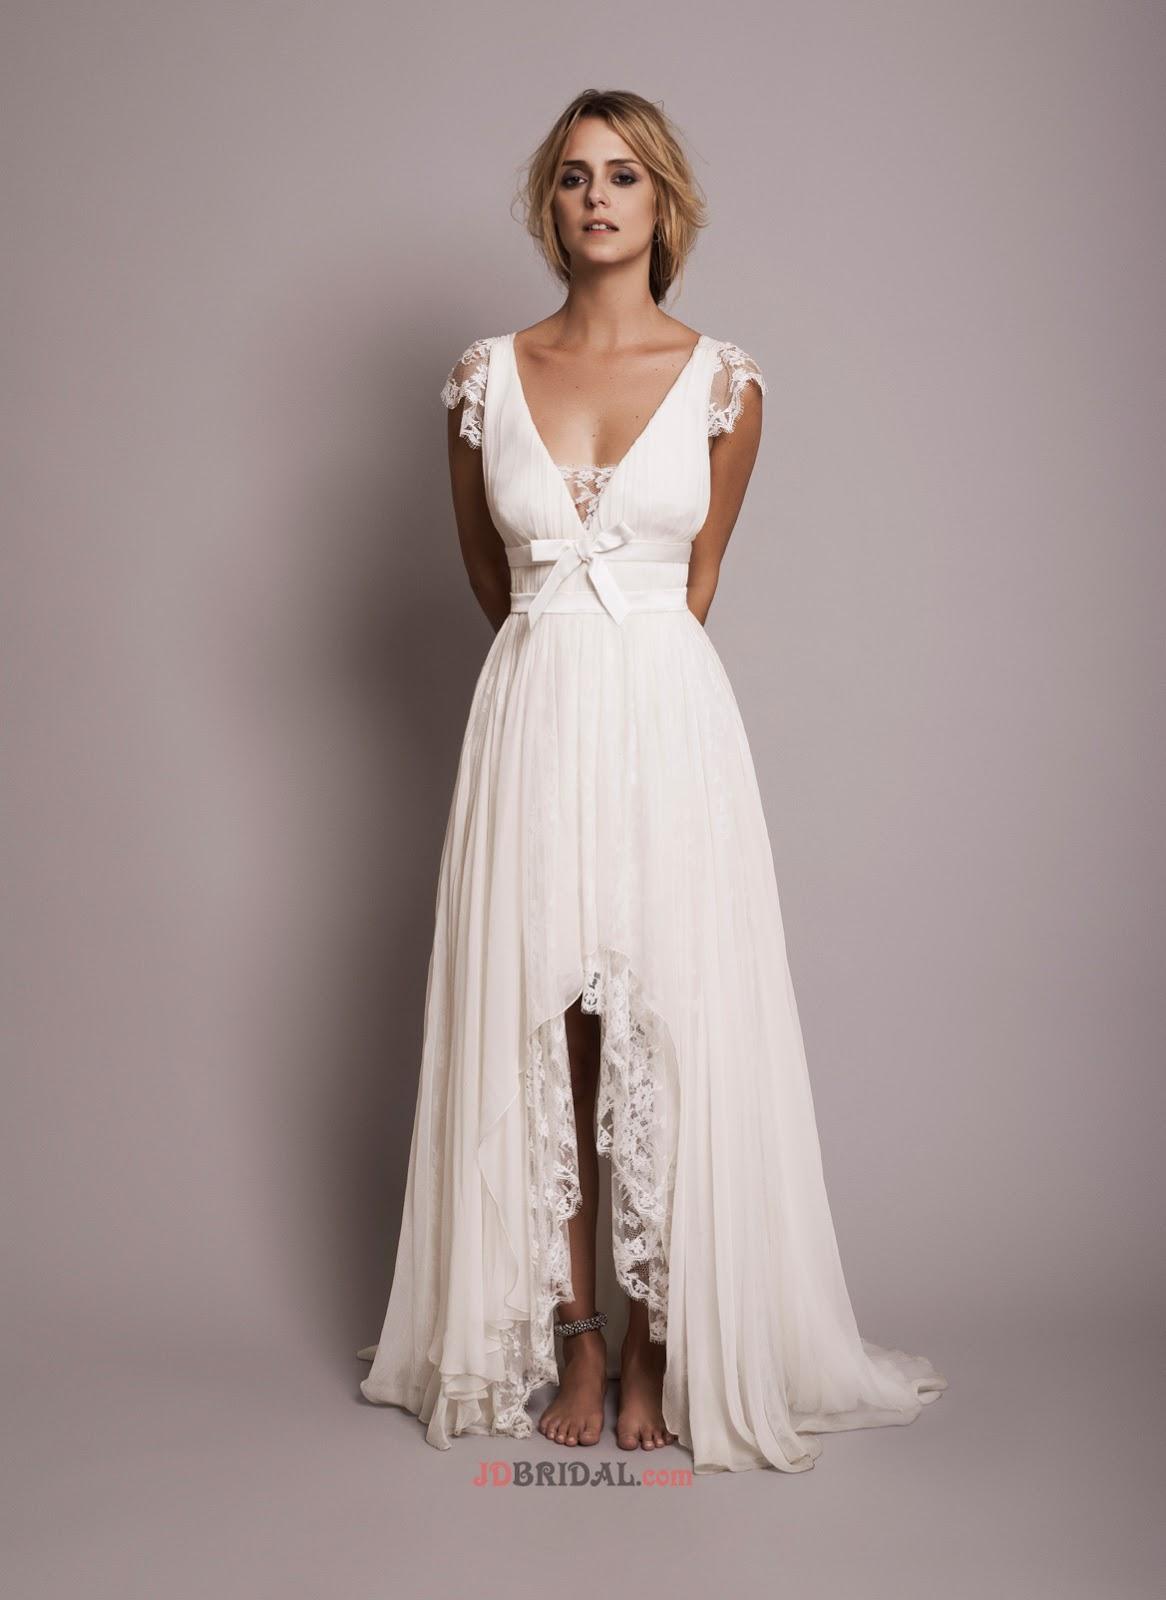 Wedding Dress Collections: Plus Size Wedding Dresses Under $100